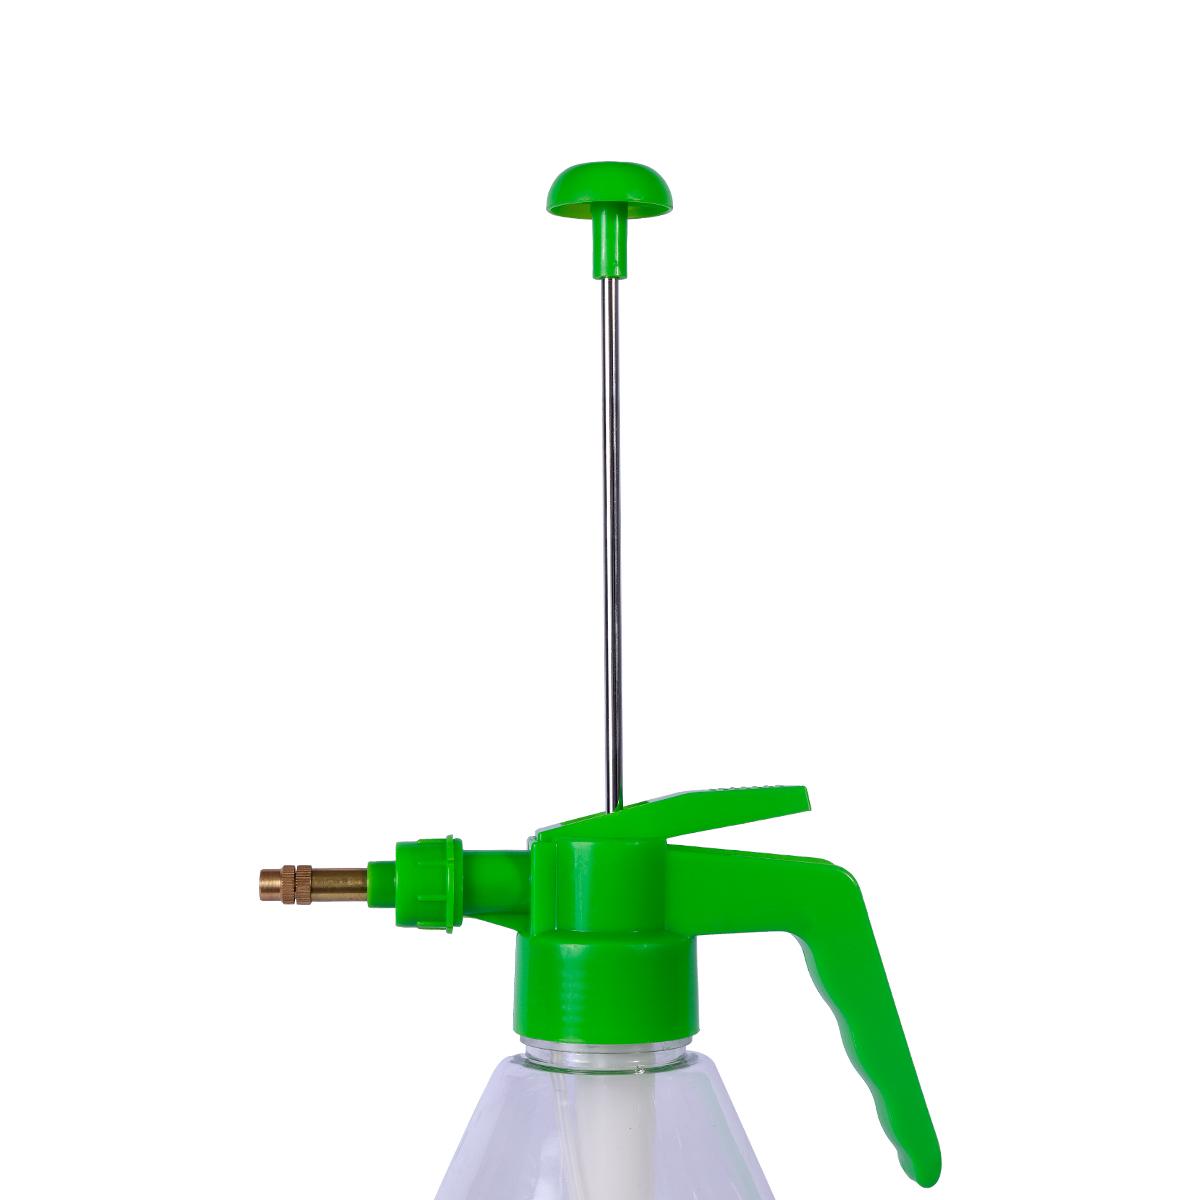 Kit De Limpeza 1 Pulverizador 1,5 Litros + 1 Desincrustante 1 Litro